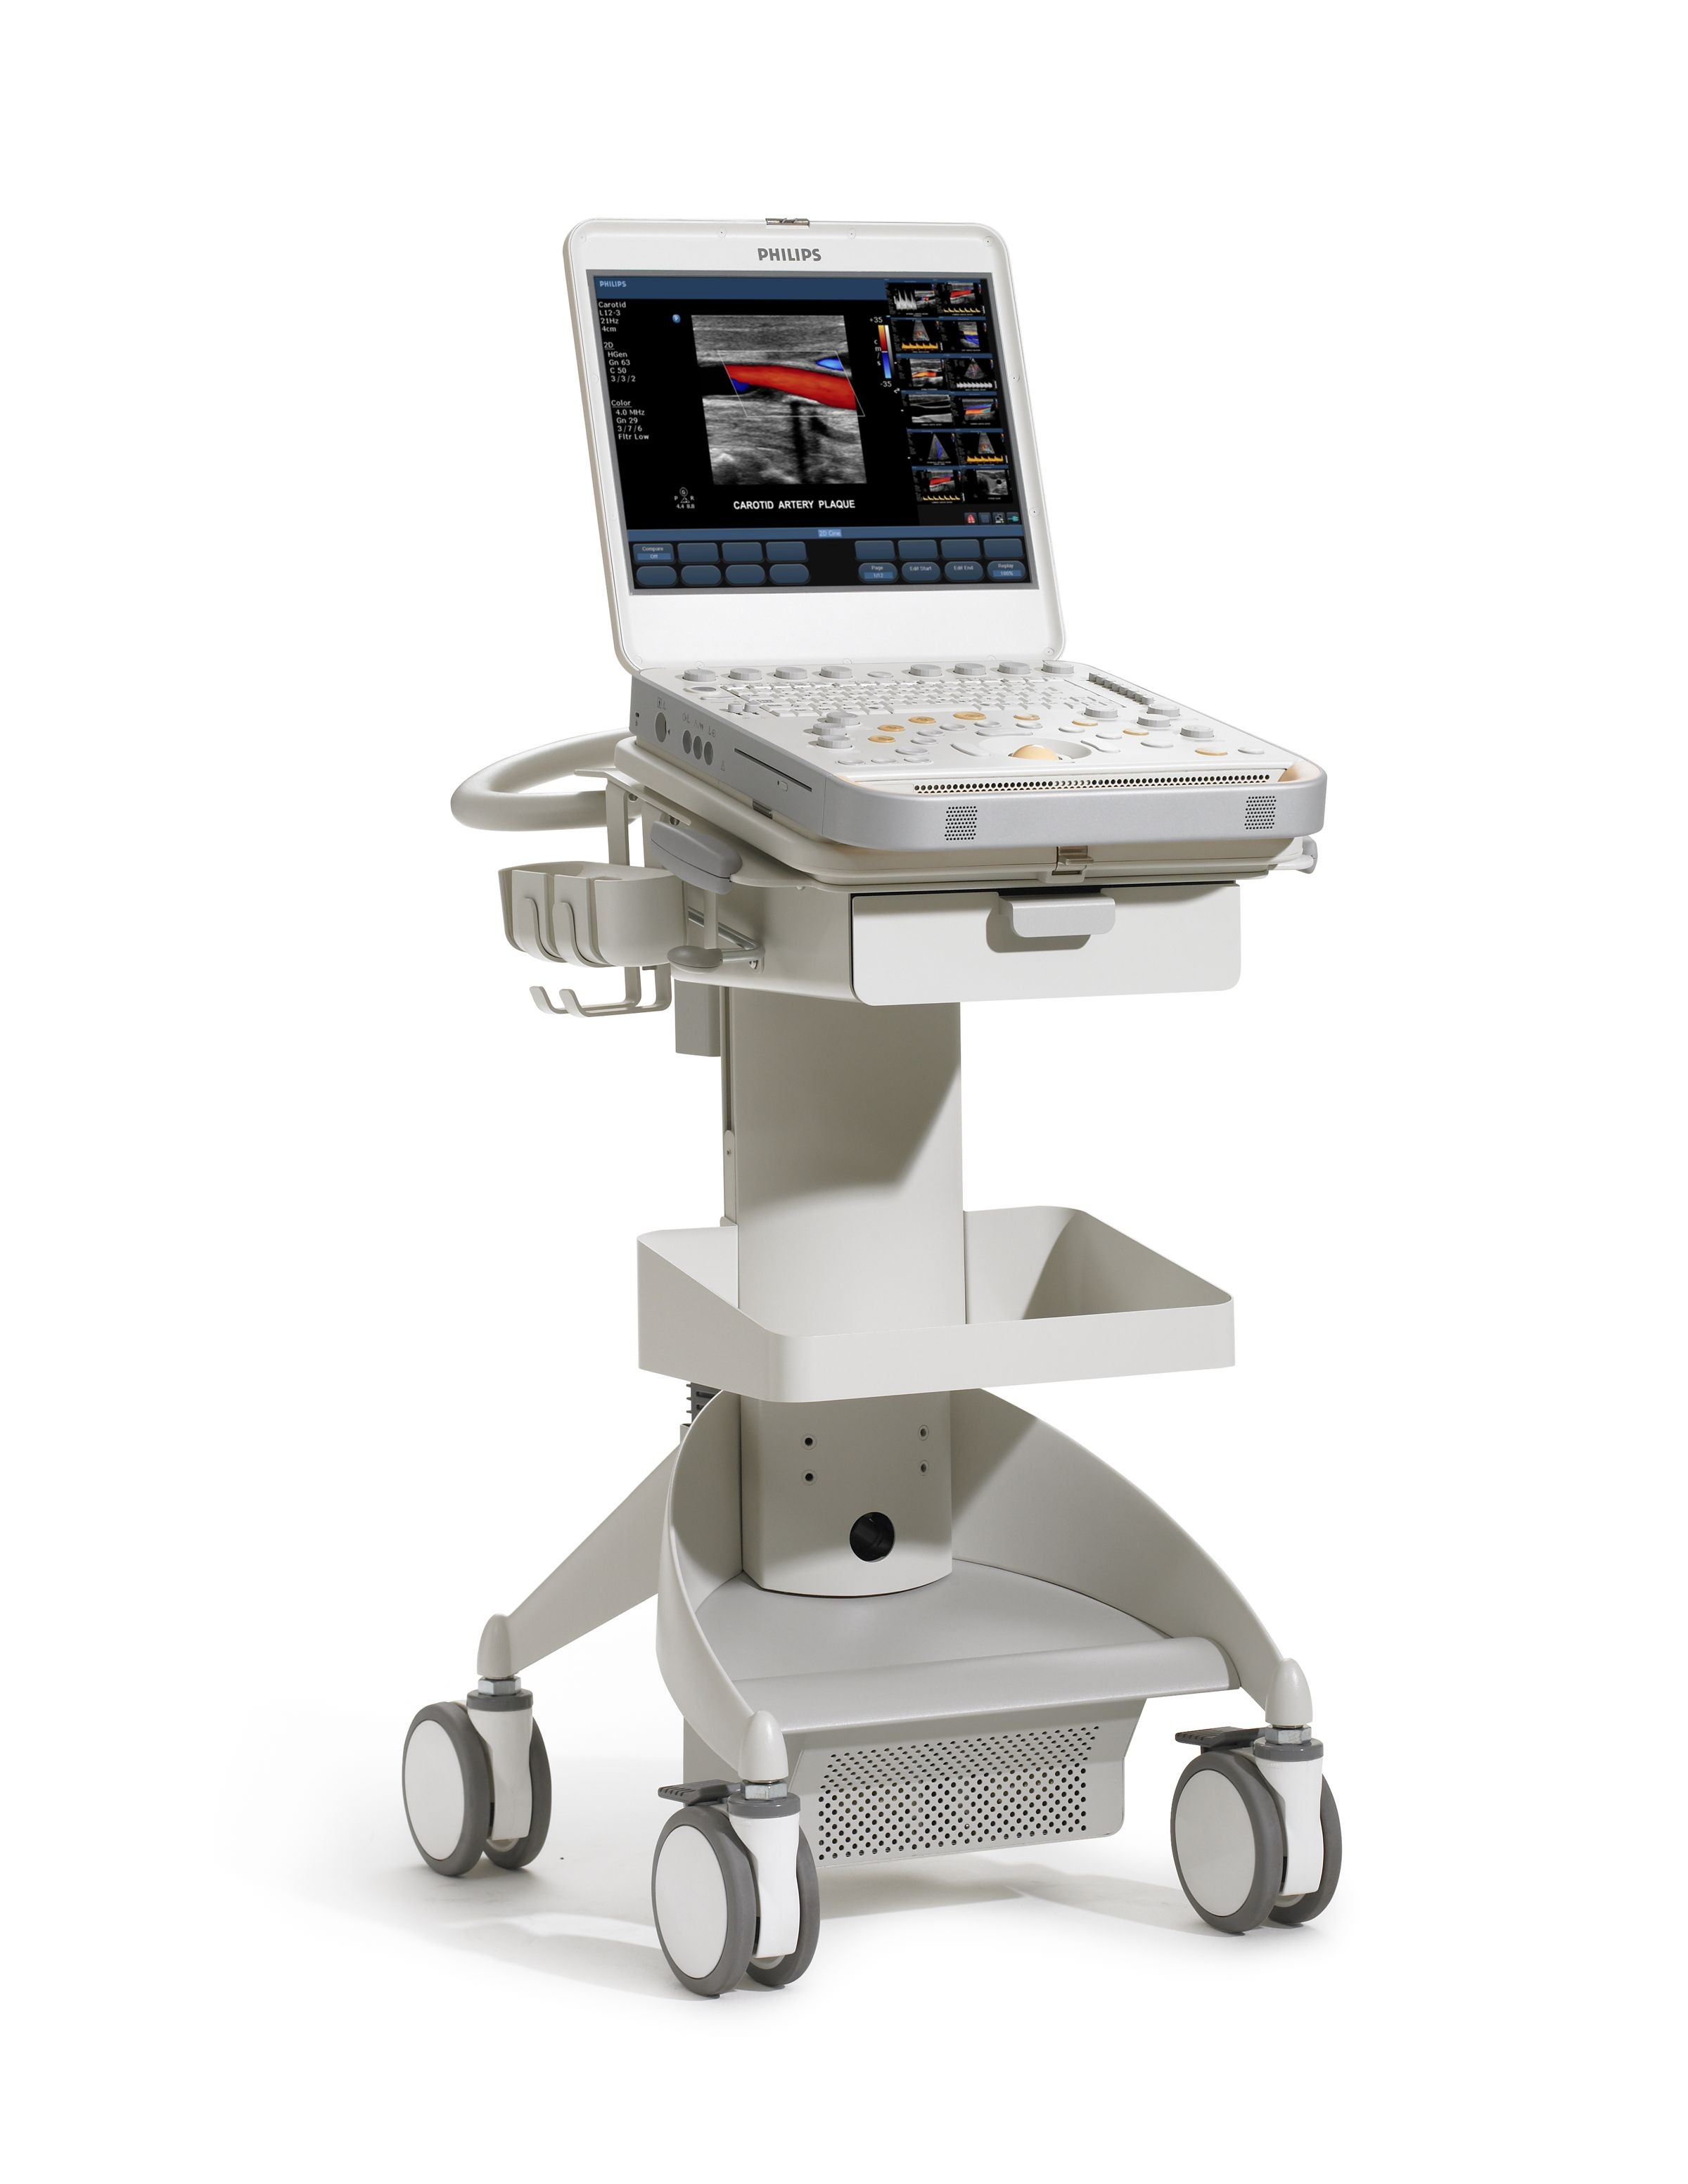 Philips Cx50 Ultraschallsystem B 246 Hm Elektromedizin